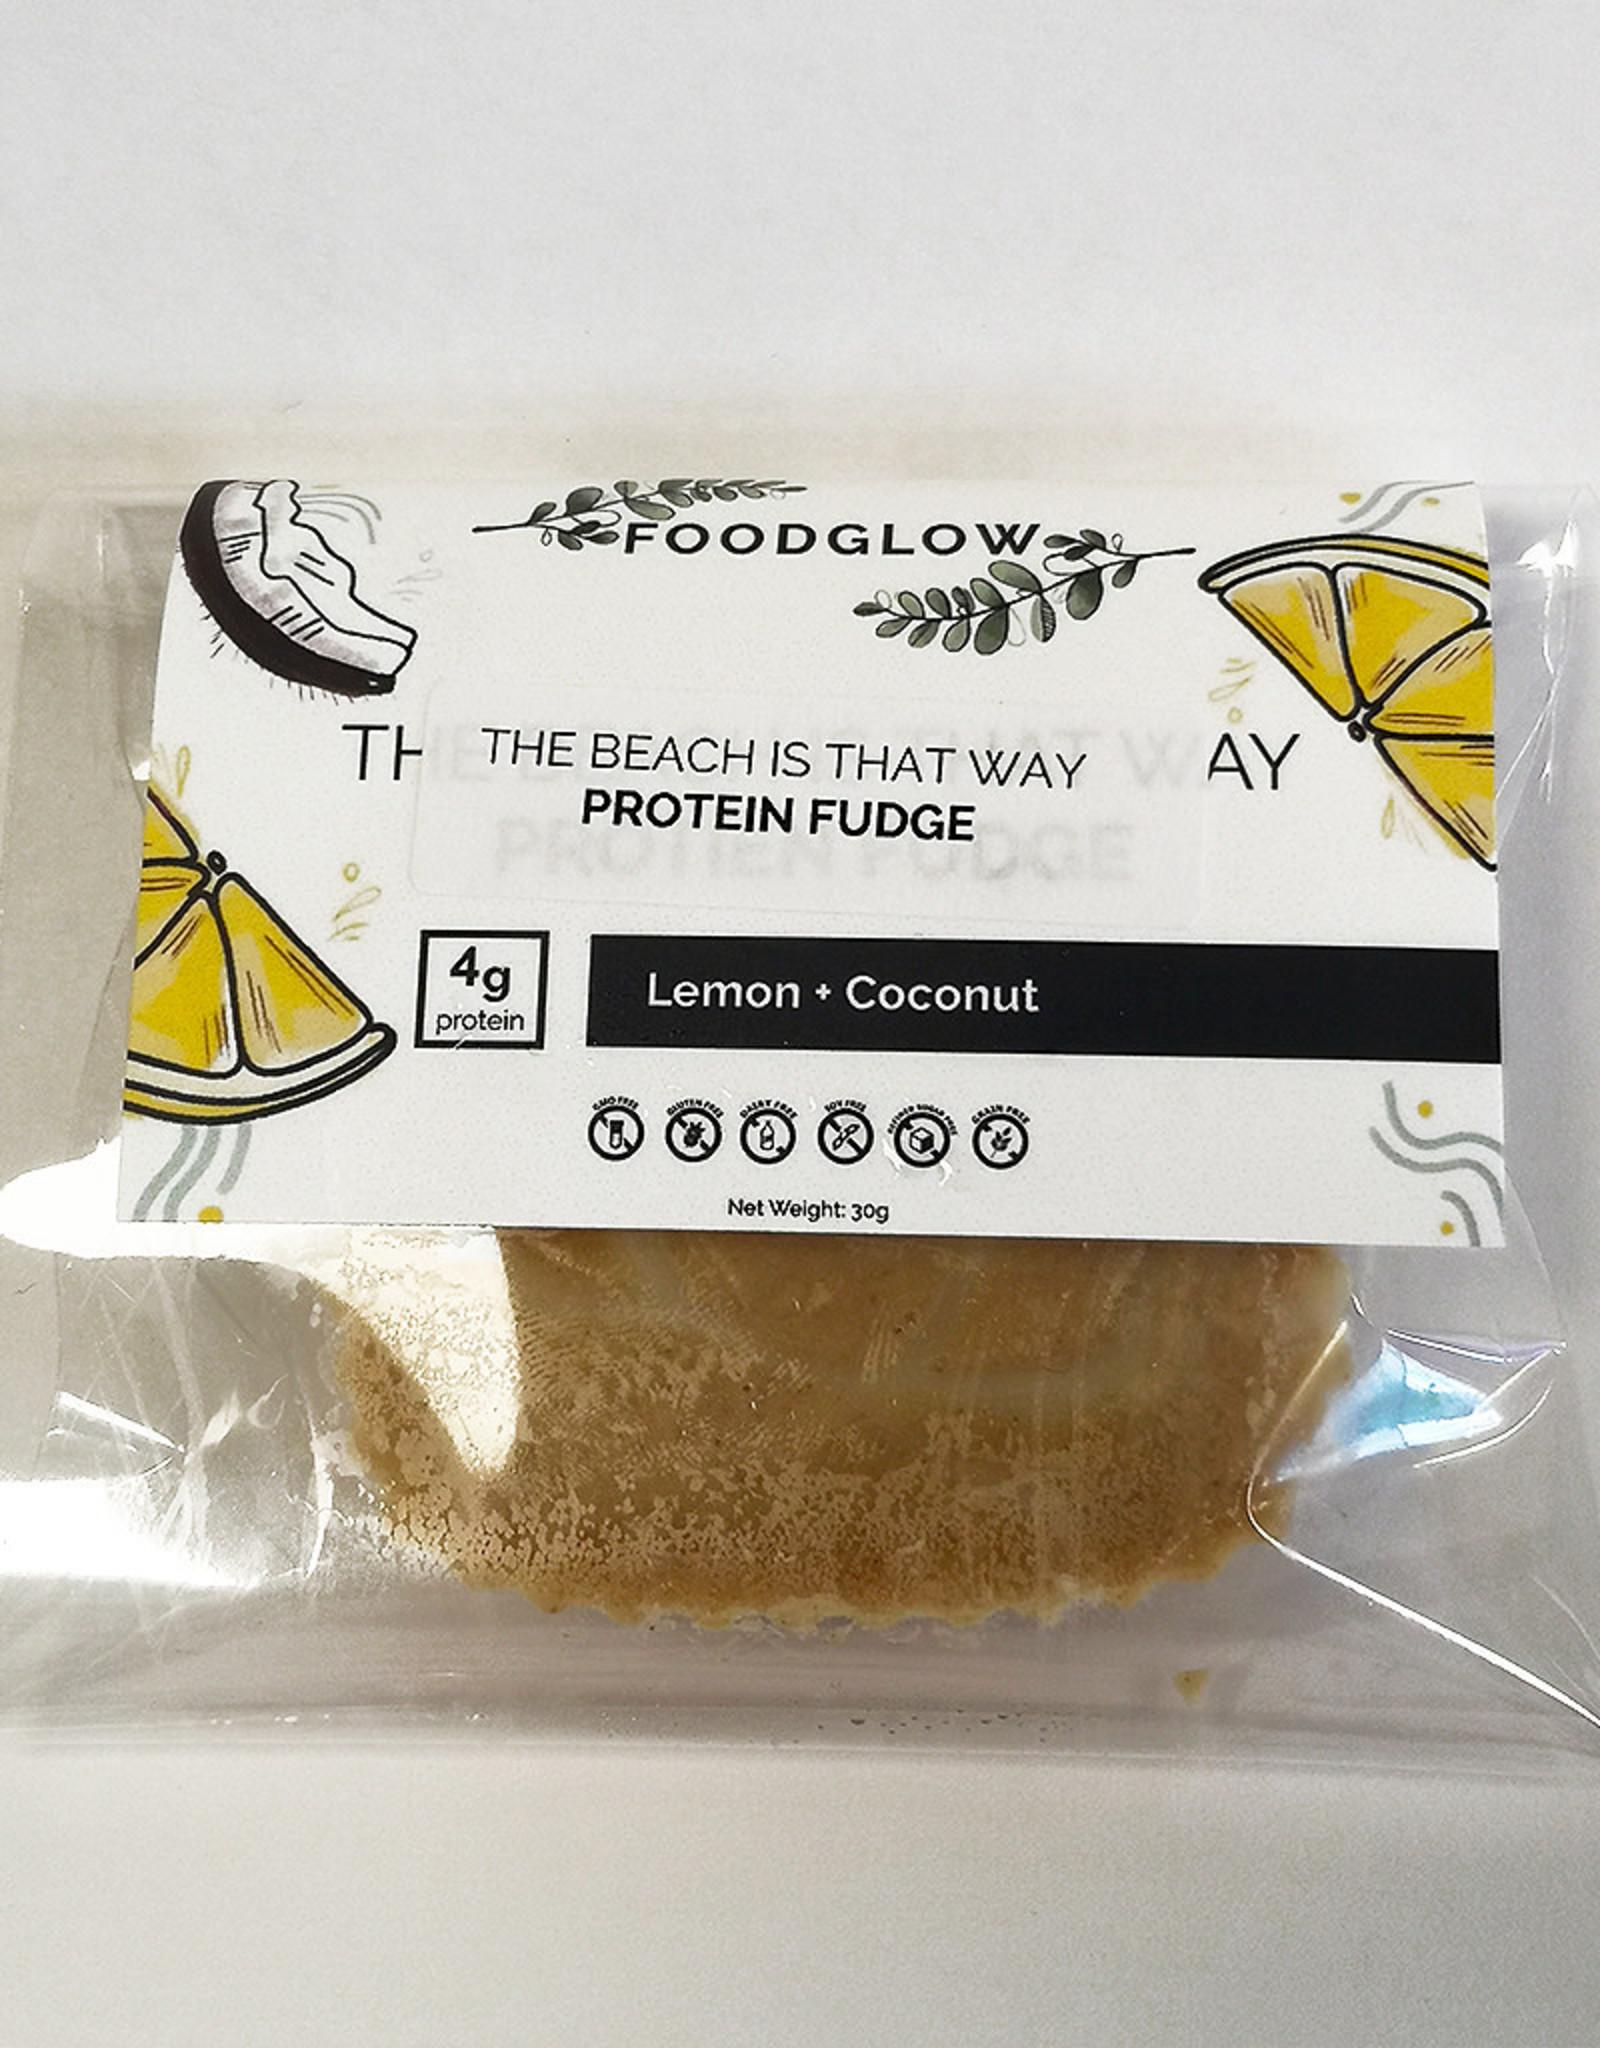 Foodglow Foodglow - Protein Fudge, Lemon Coconut